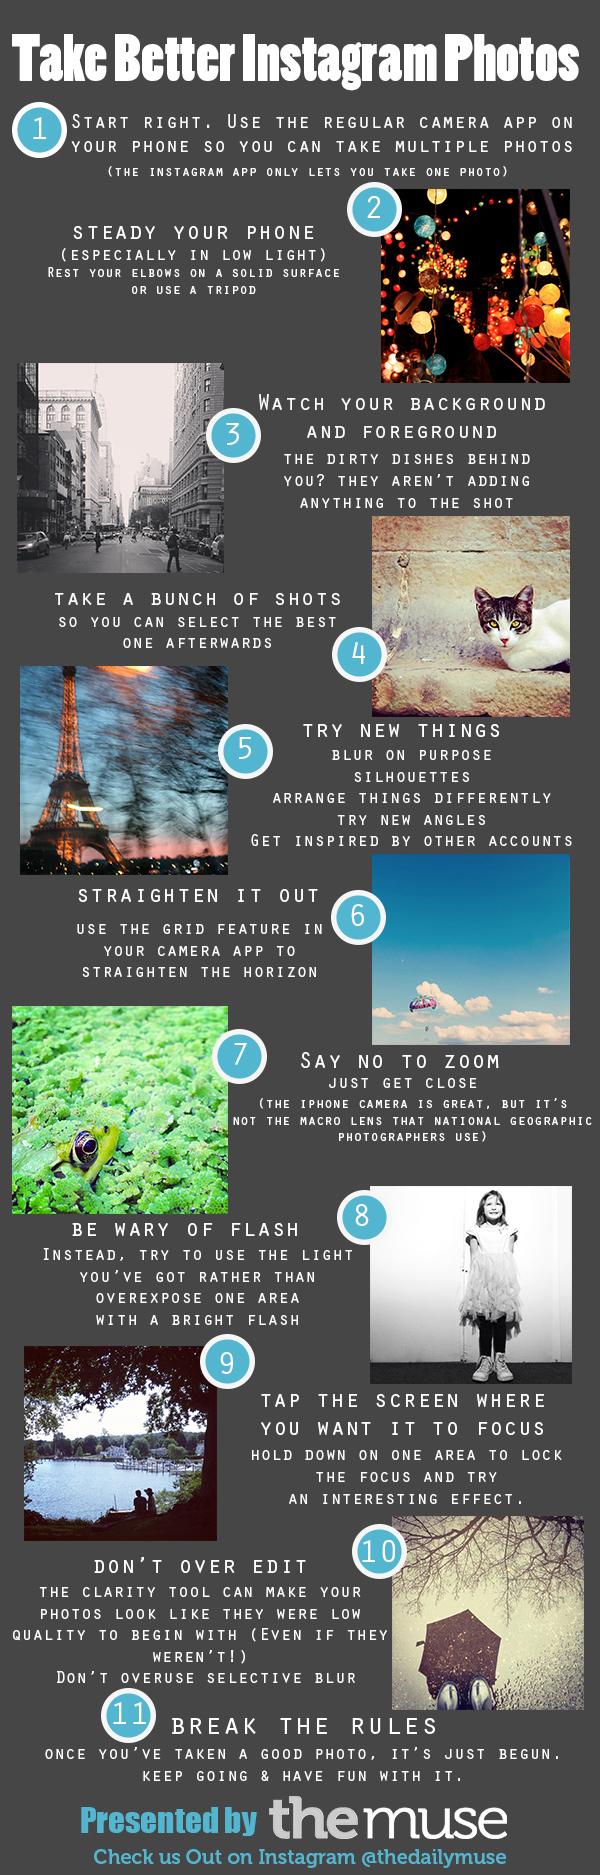 11 Secrets to Taking Better Instagram Photos